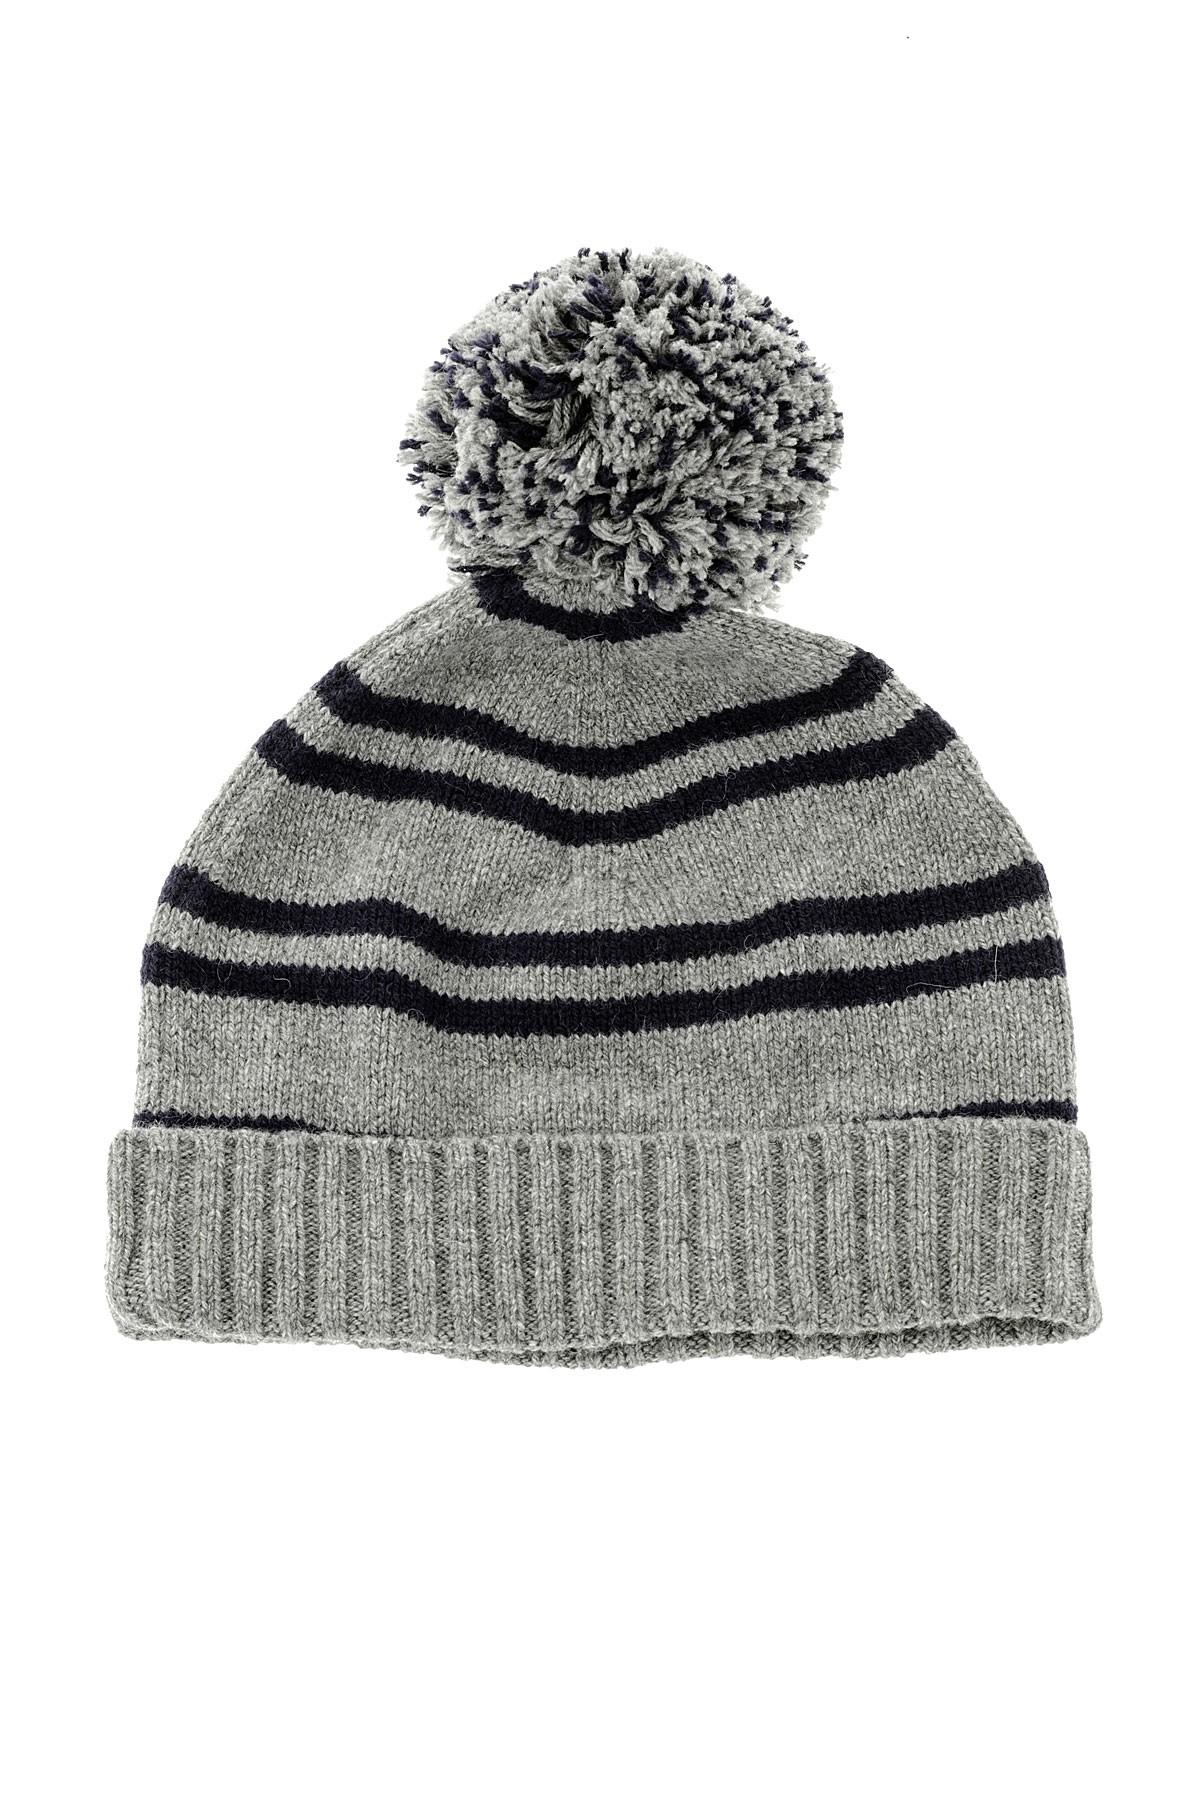 db423a7f3bc SUN68 Grey striped hat for man autumn winter 14-15 - Rione Fontana